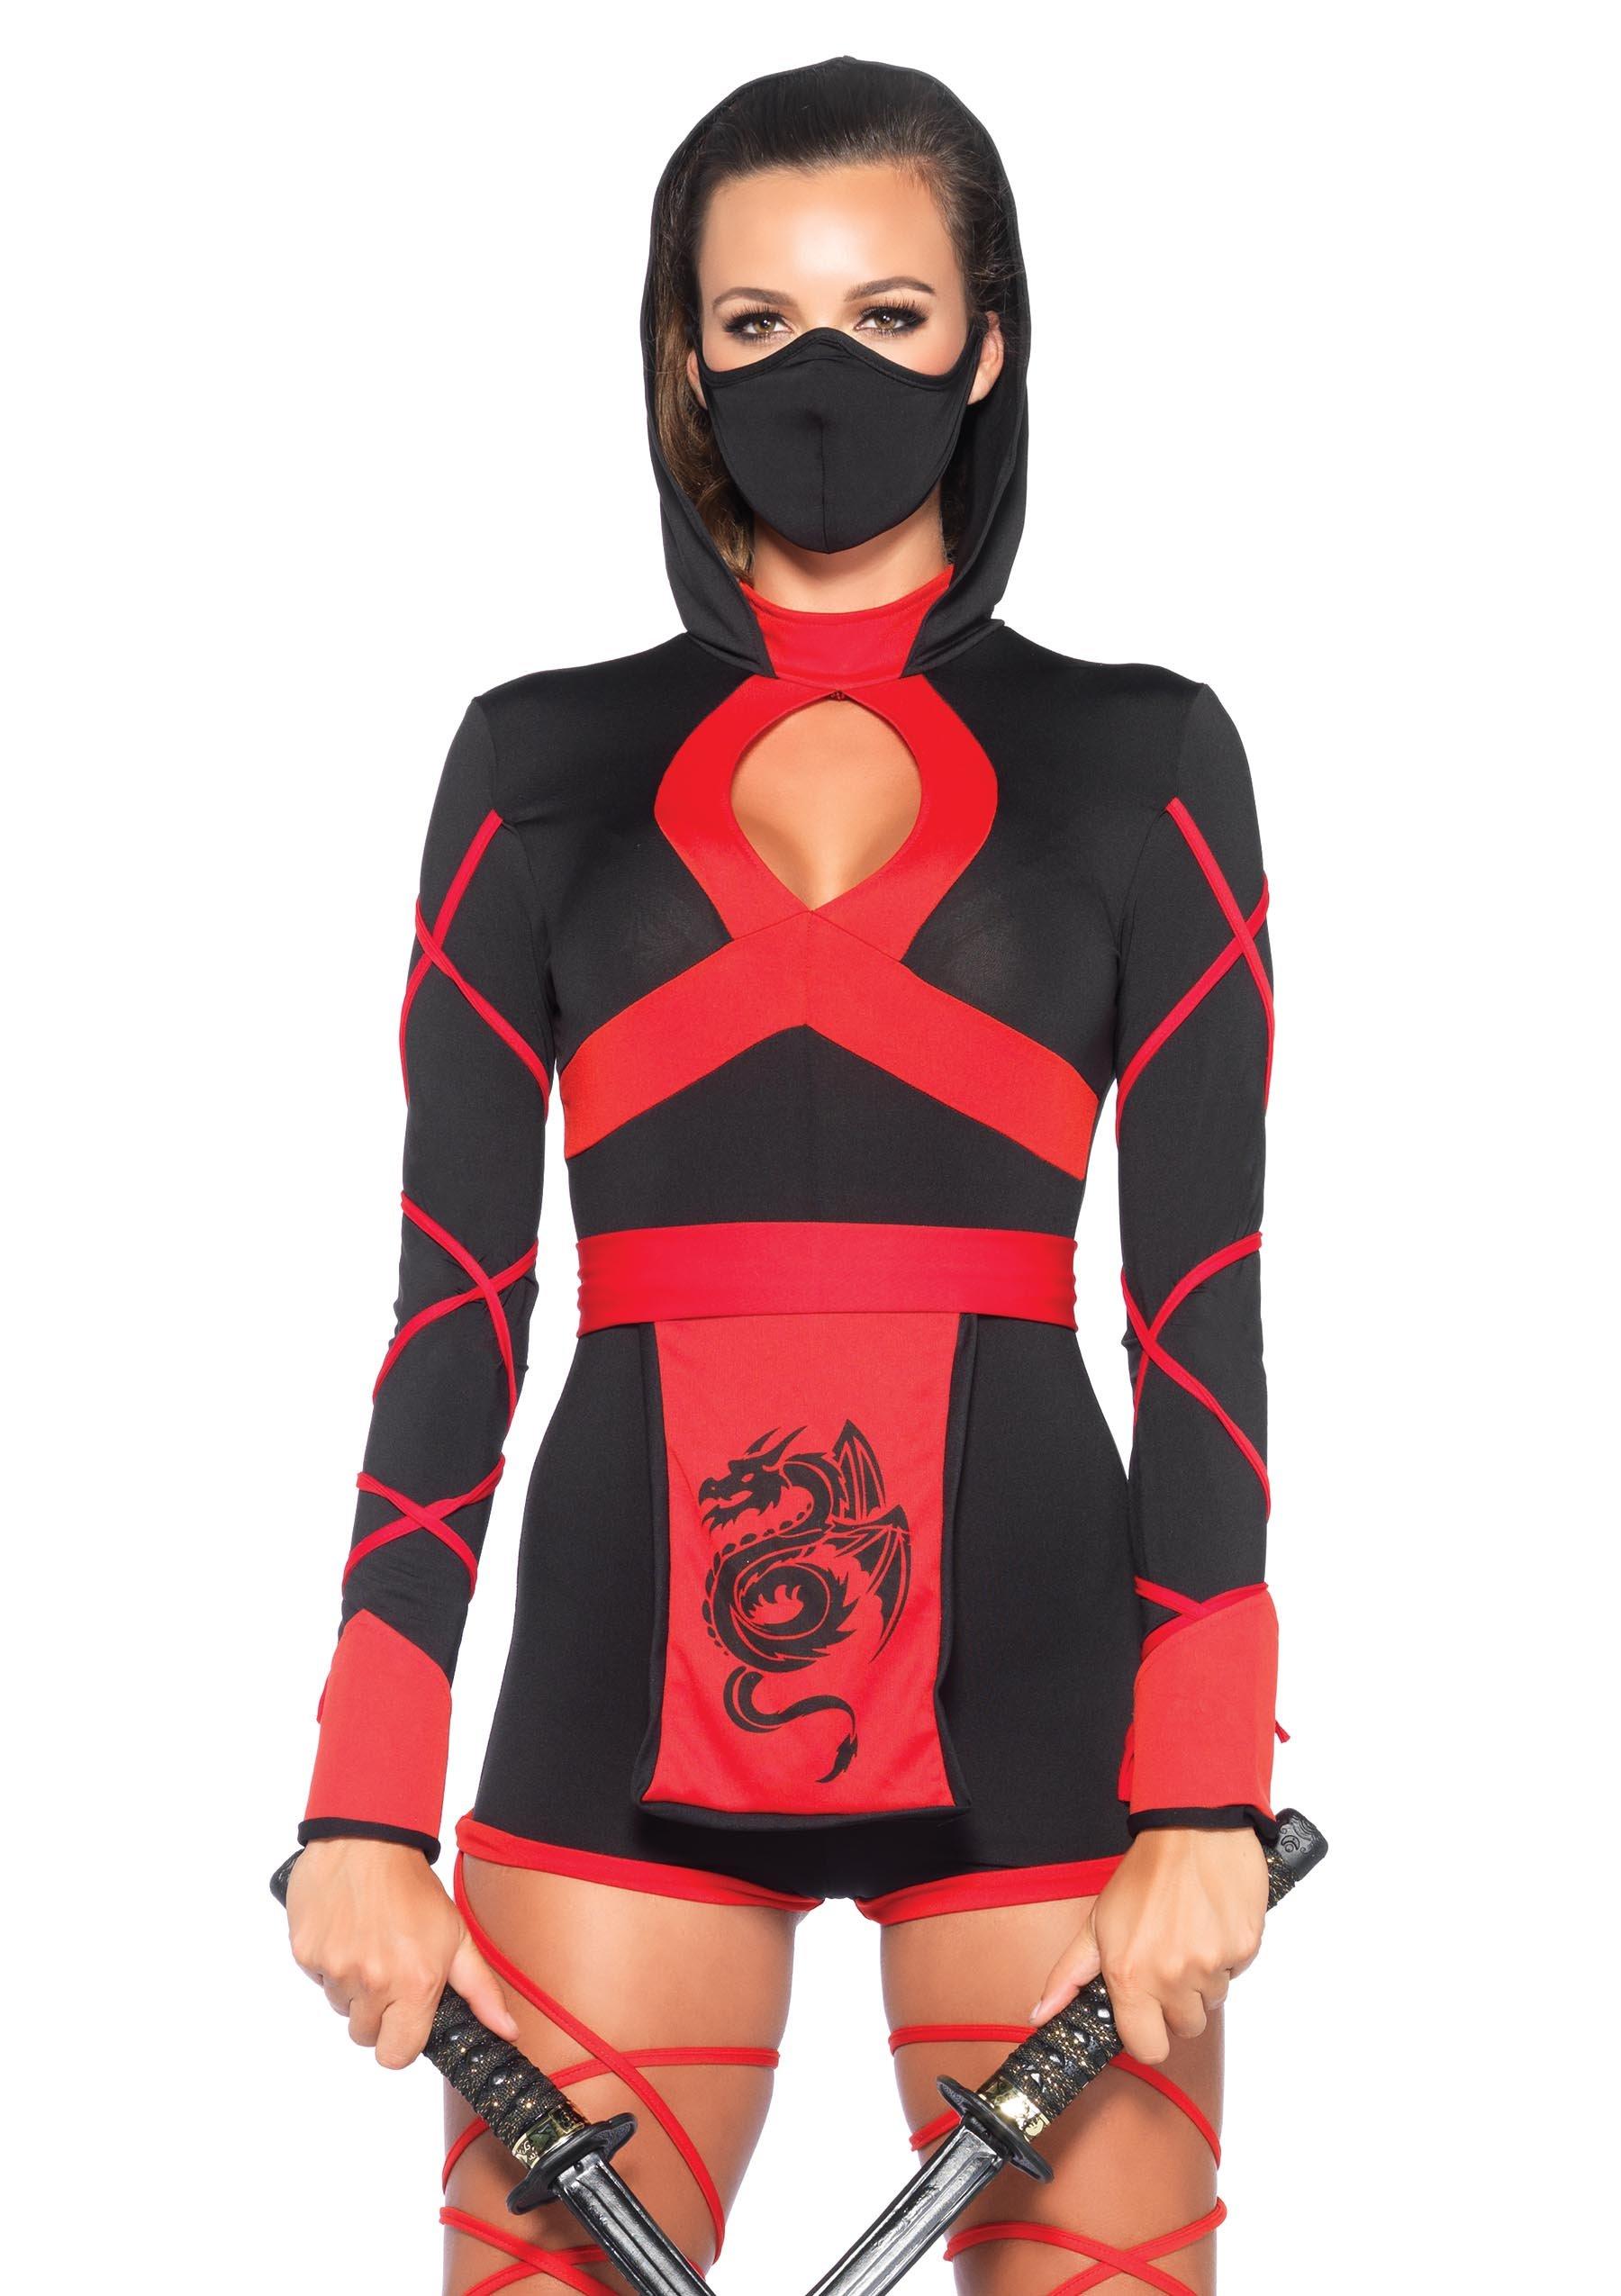 LEG-AVENUE-85401-Dragon-Ninja-Damen-kostm-Gre-Small-EUR-36-Karneval-Fasching